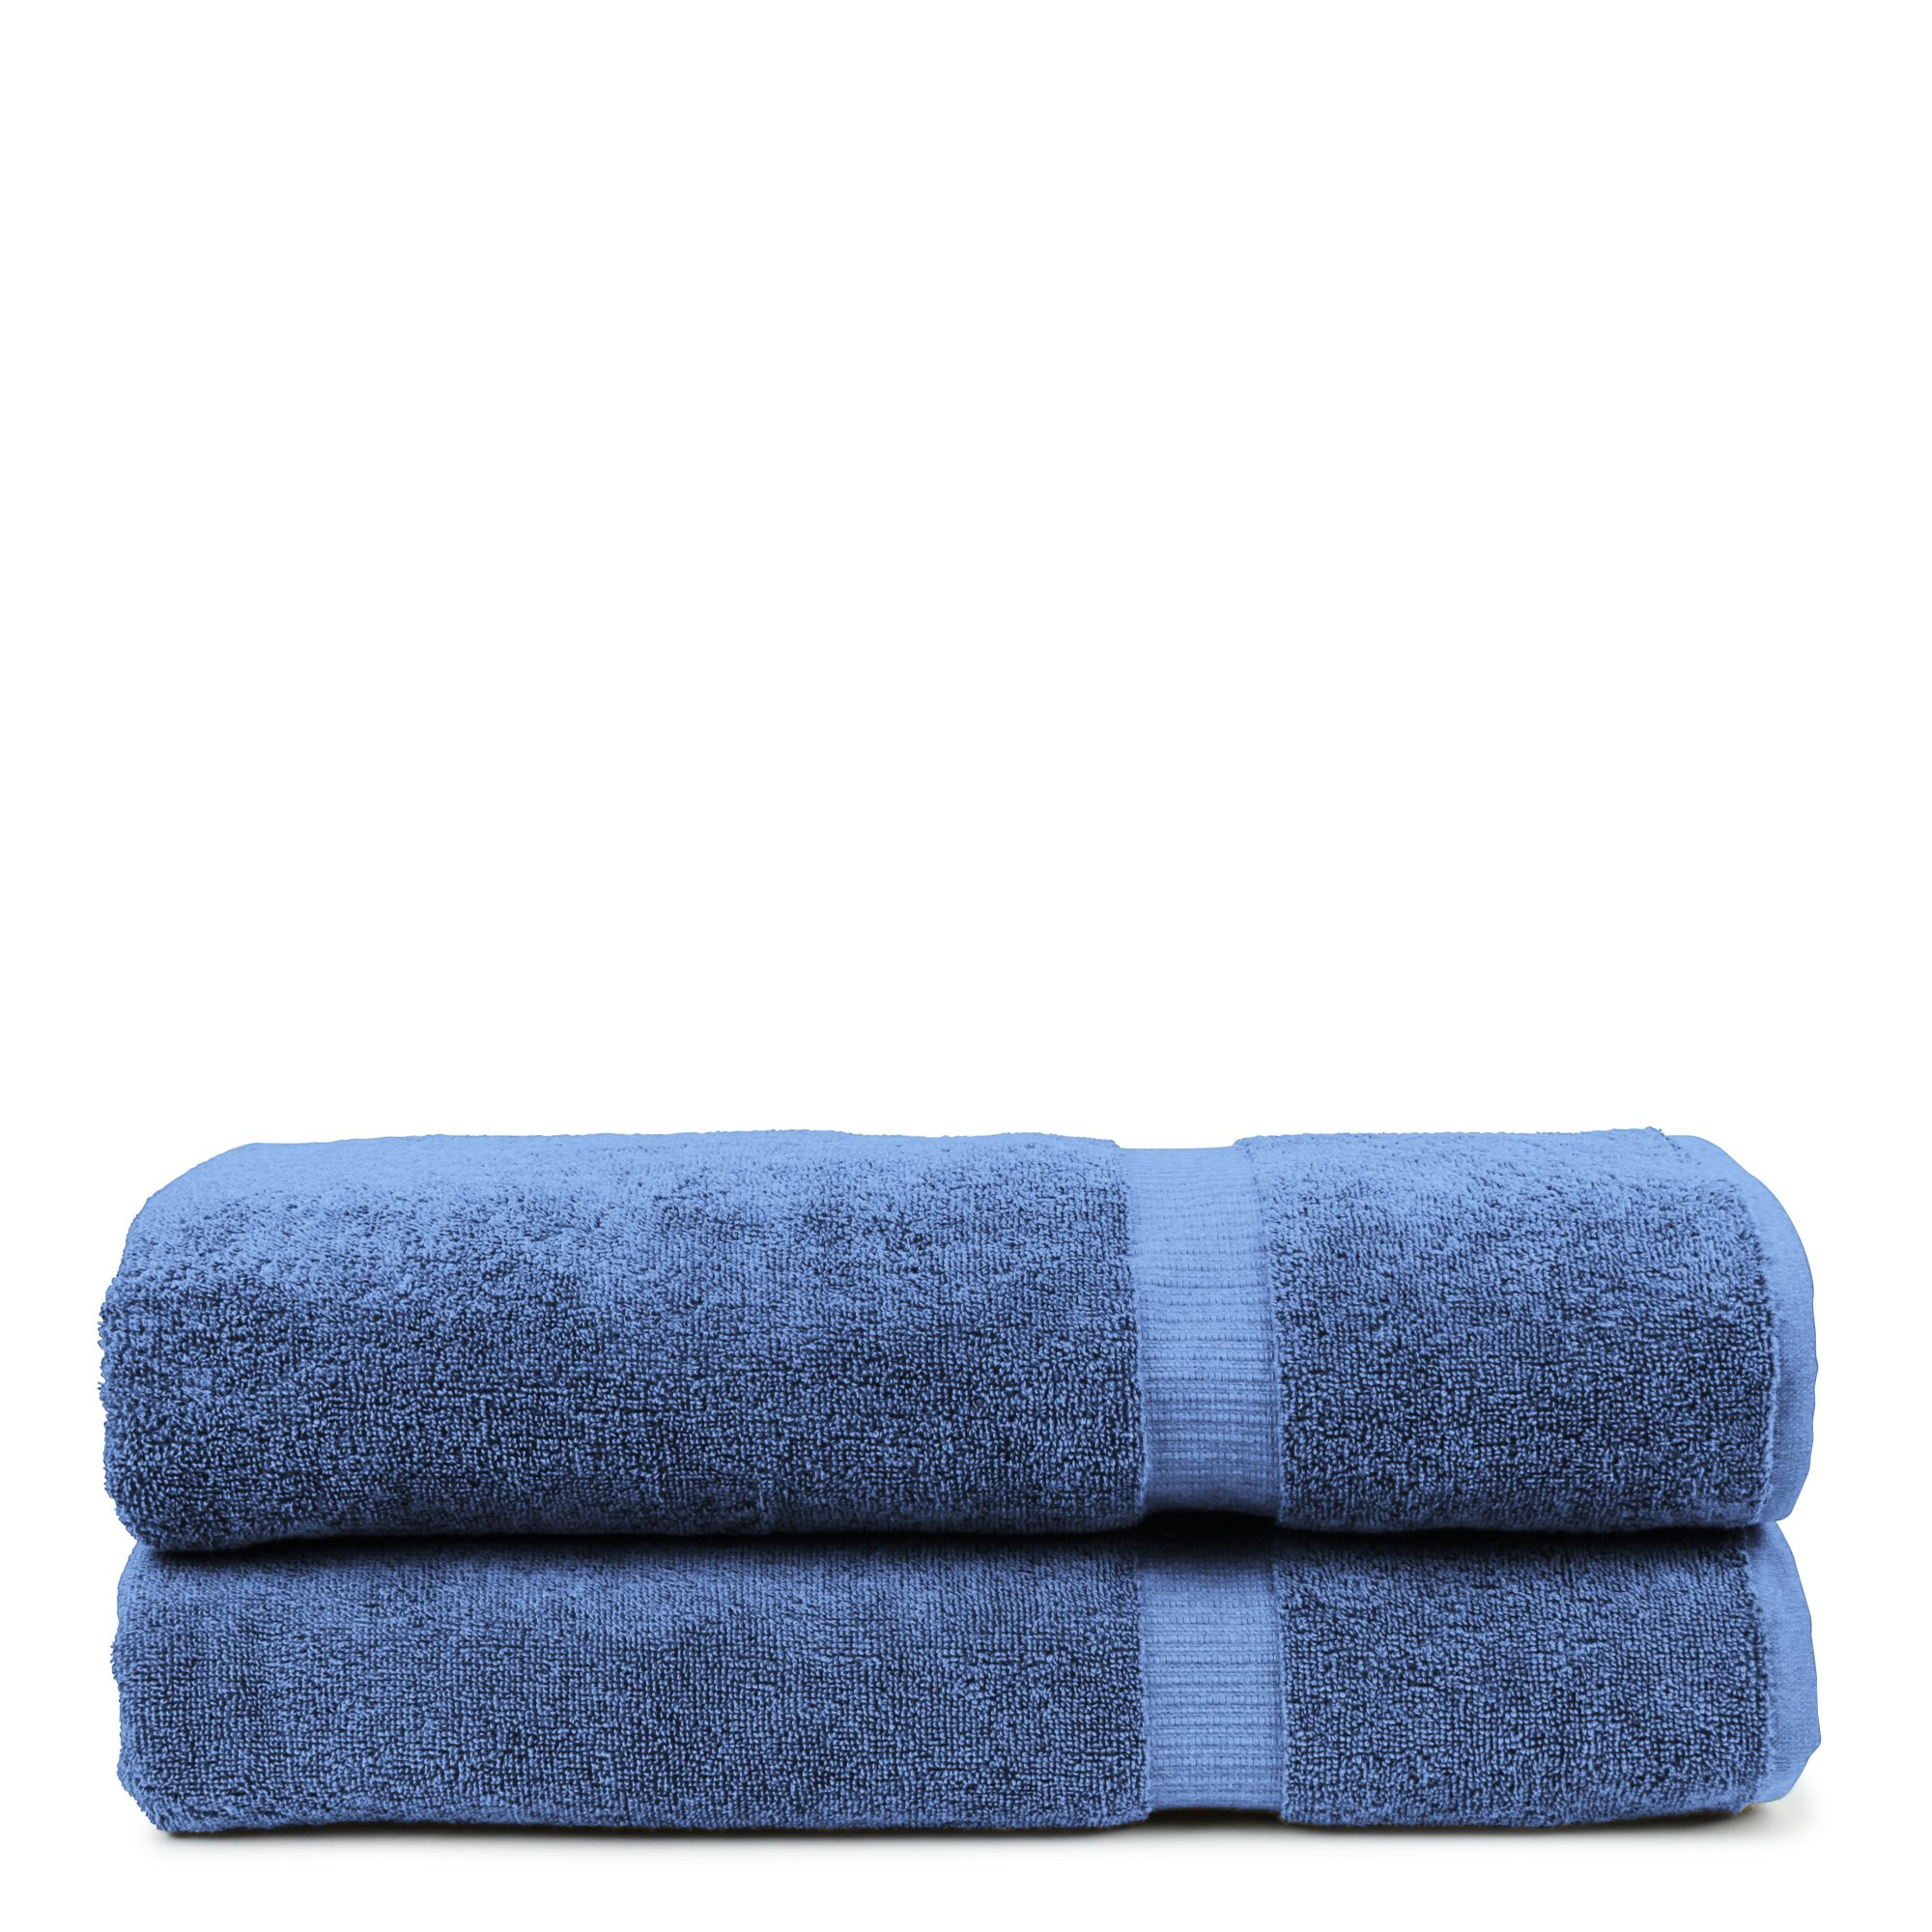 Bare Cotton Luxury Hotel & Spa Towel Turkish Bath Sheets Dobby Border (Wedgewood, Bath Sheets - Set of 2)